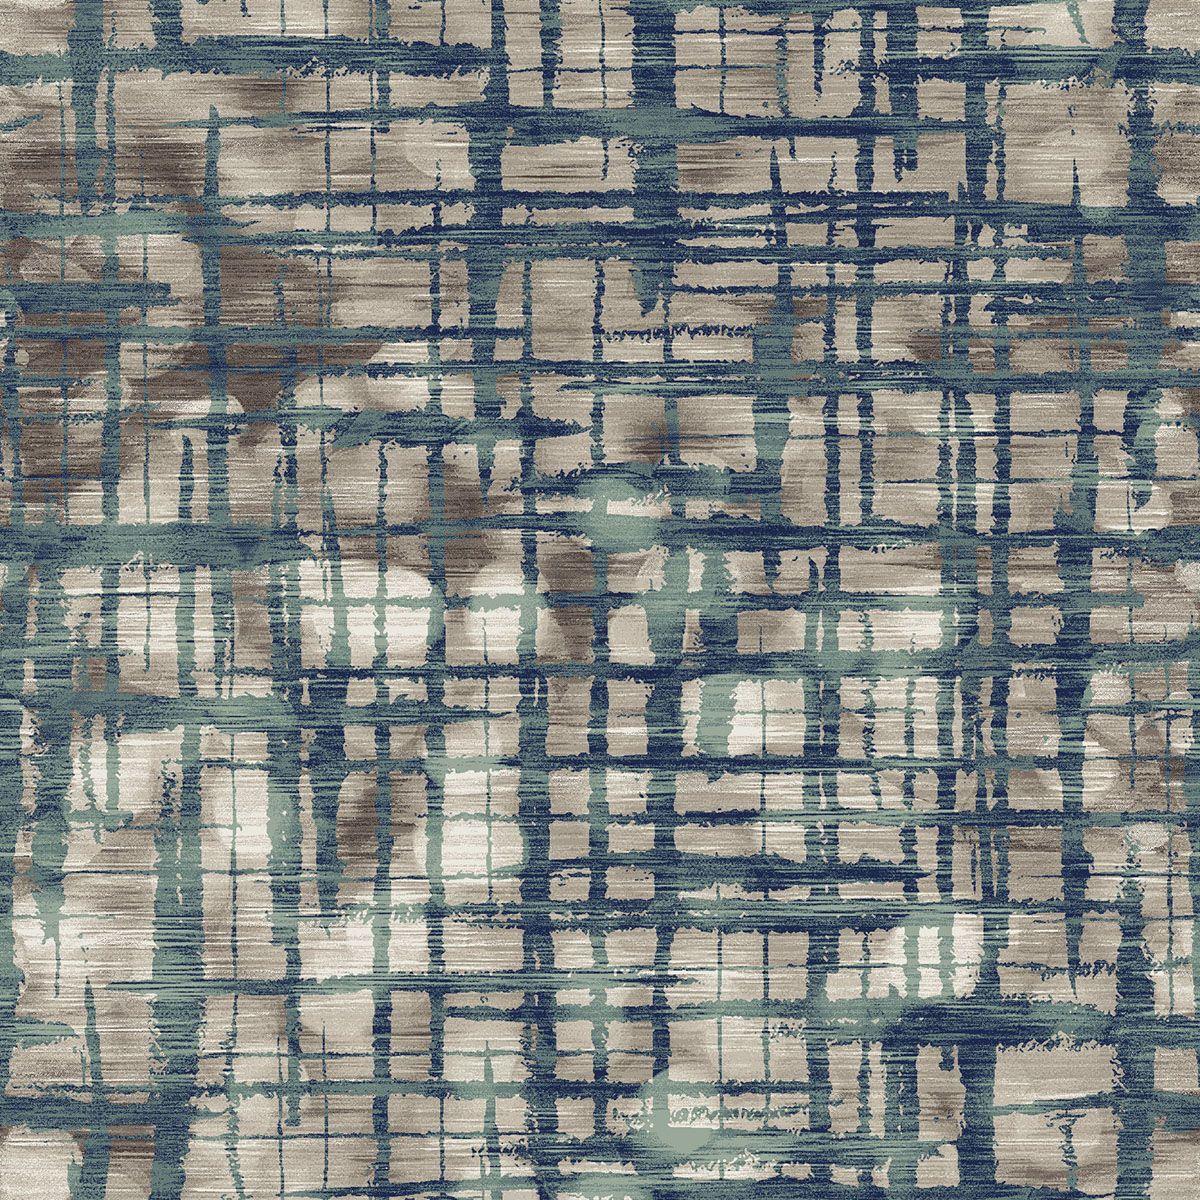 World Map Rug Costco: Durkan Print: Esprit (Virginia Langley)